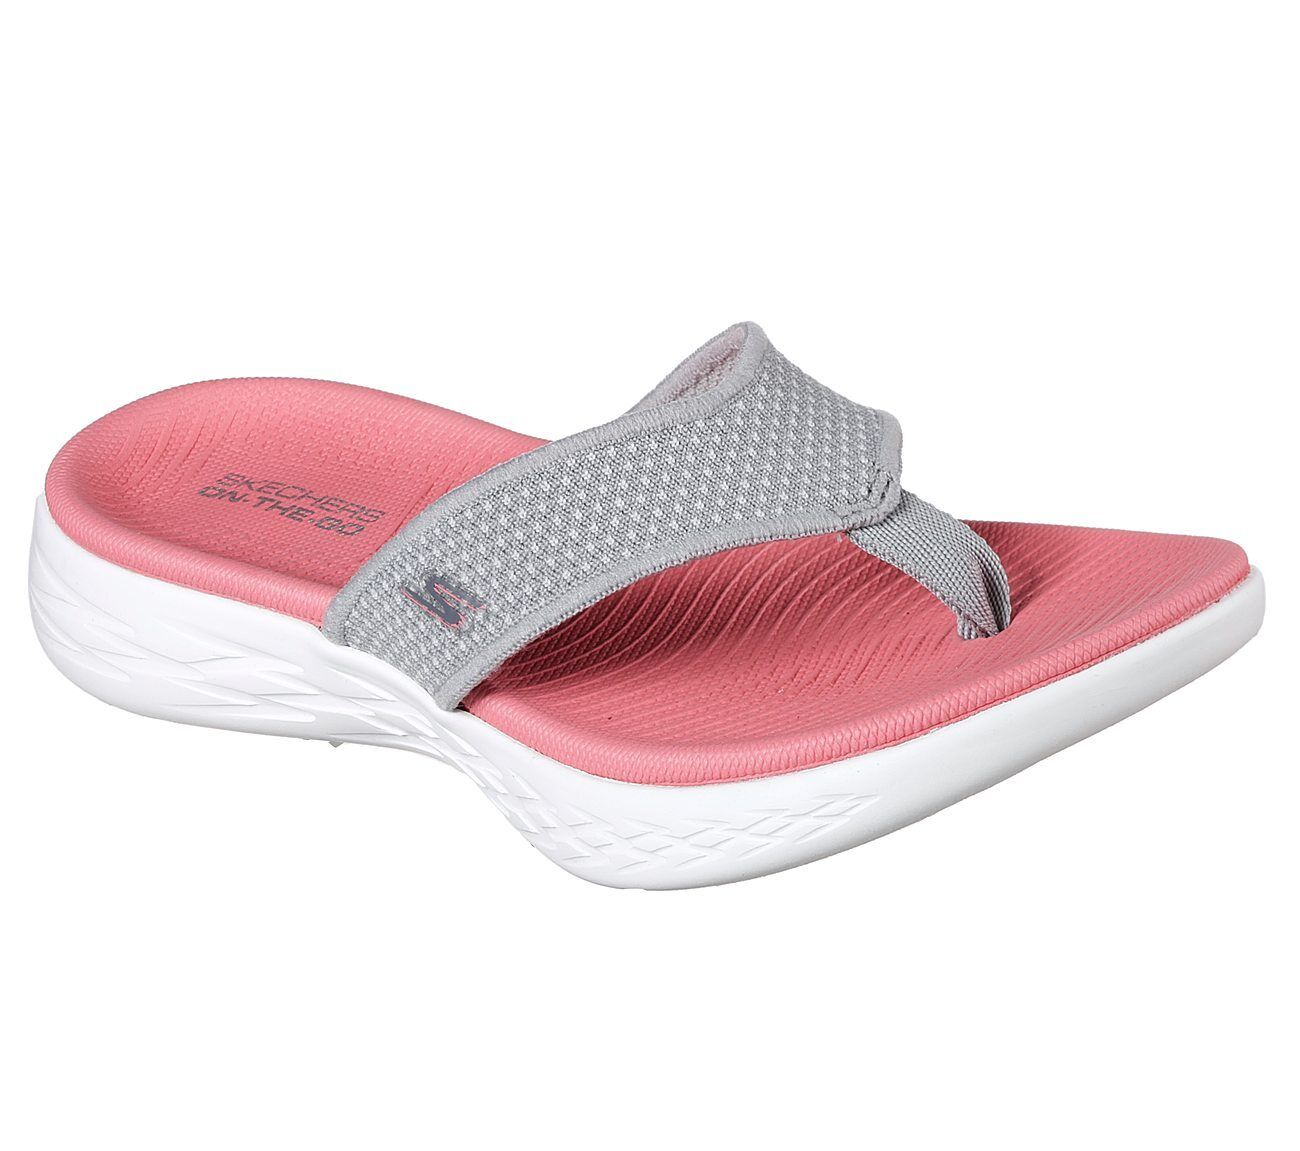 SKECHERS ON THE Go 600 Flip Flops Memory Foam Summer Womens